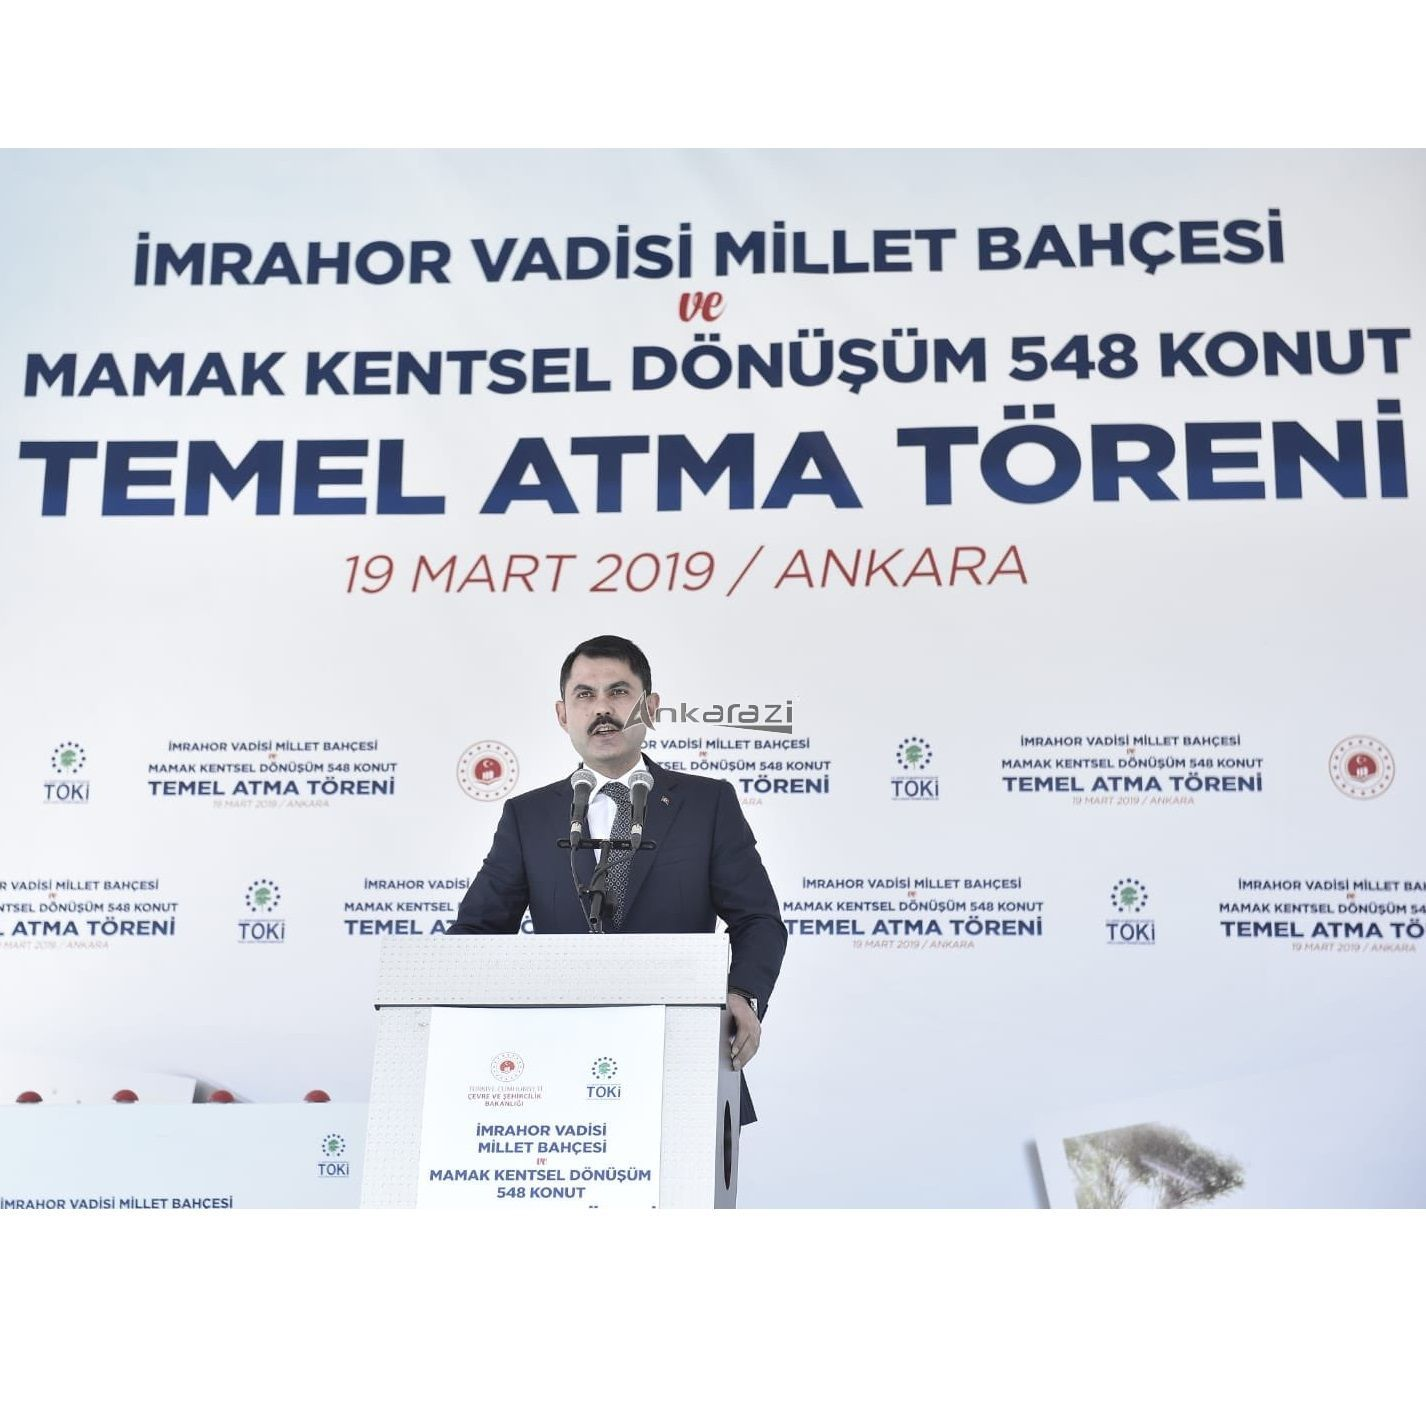 Kanal Ankara ve Mamak 548 Konut Temel Atma Töreni…